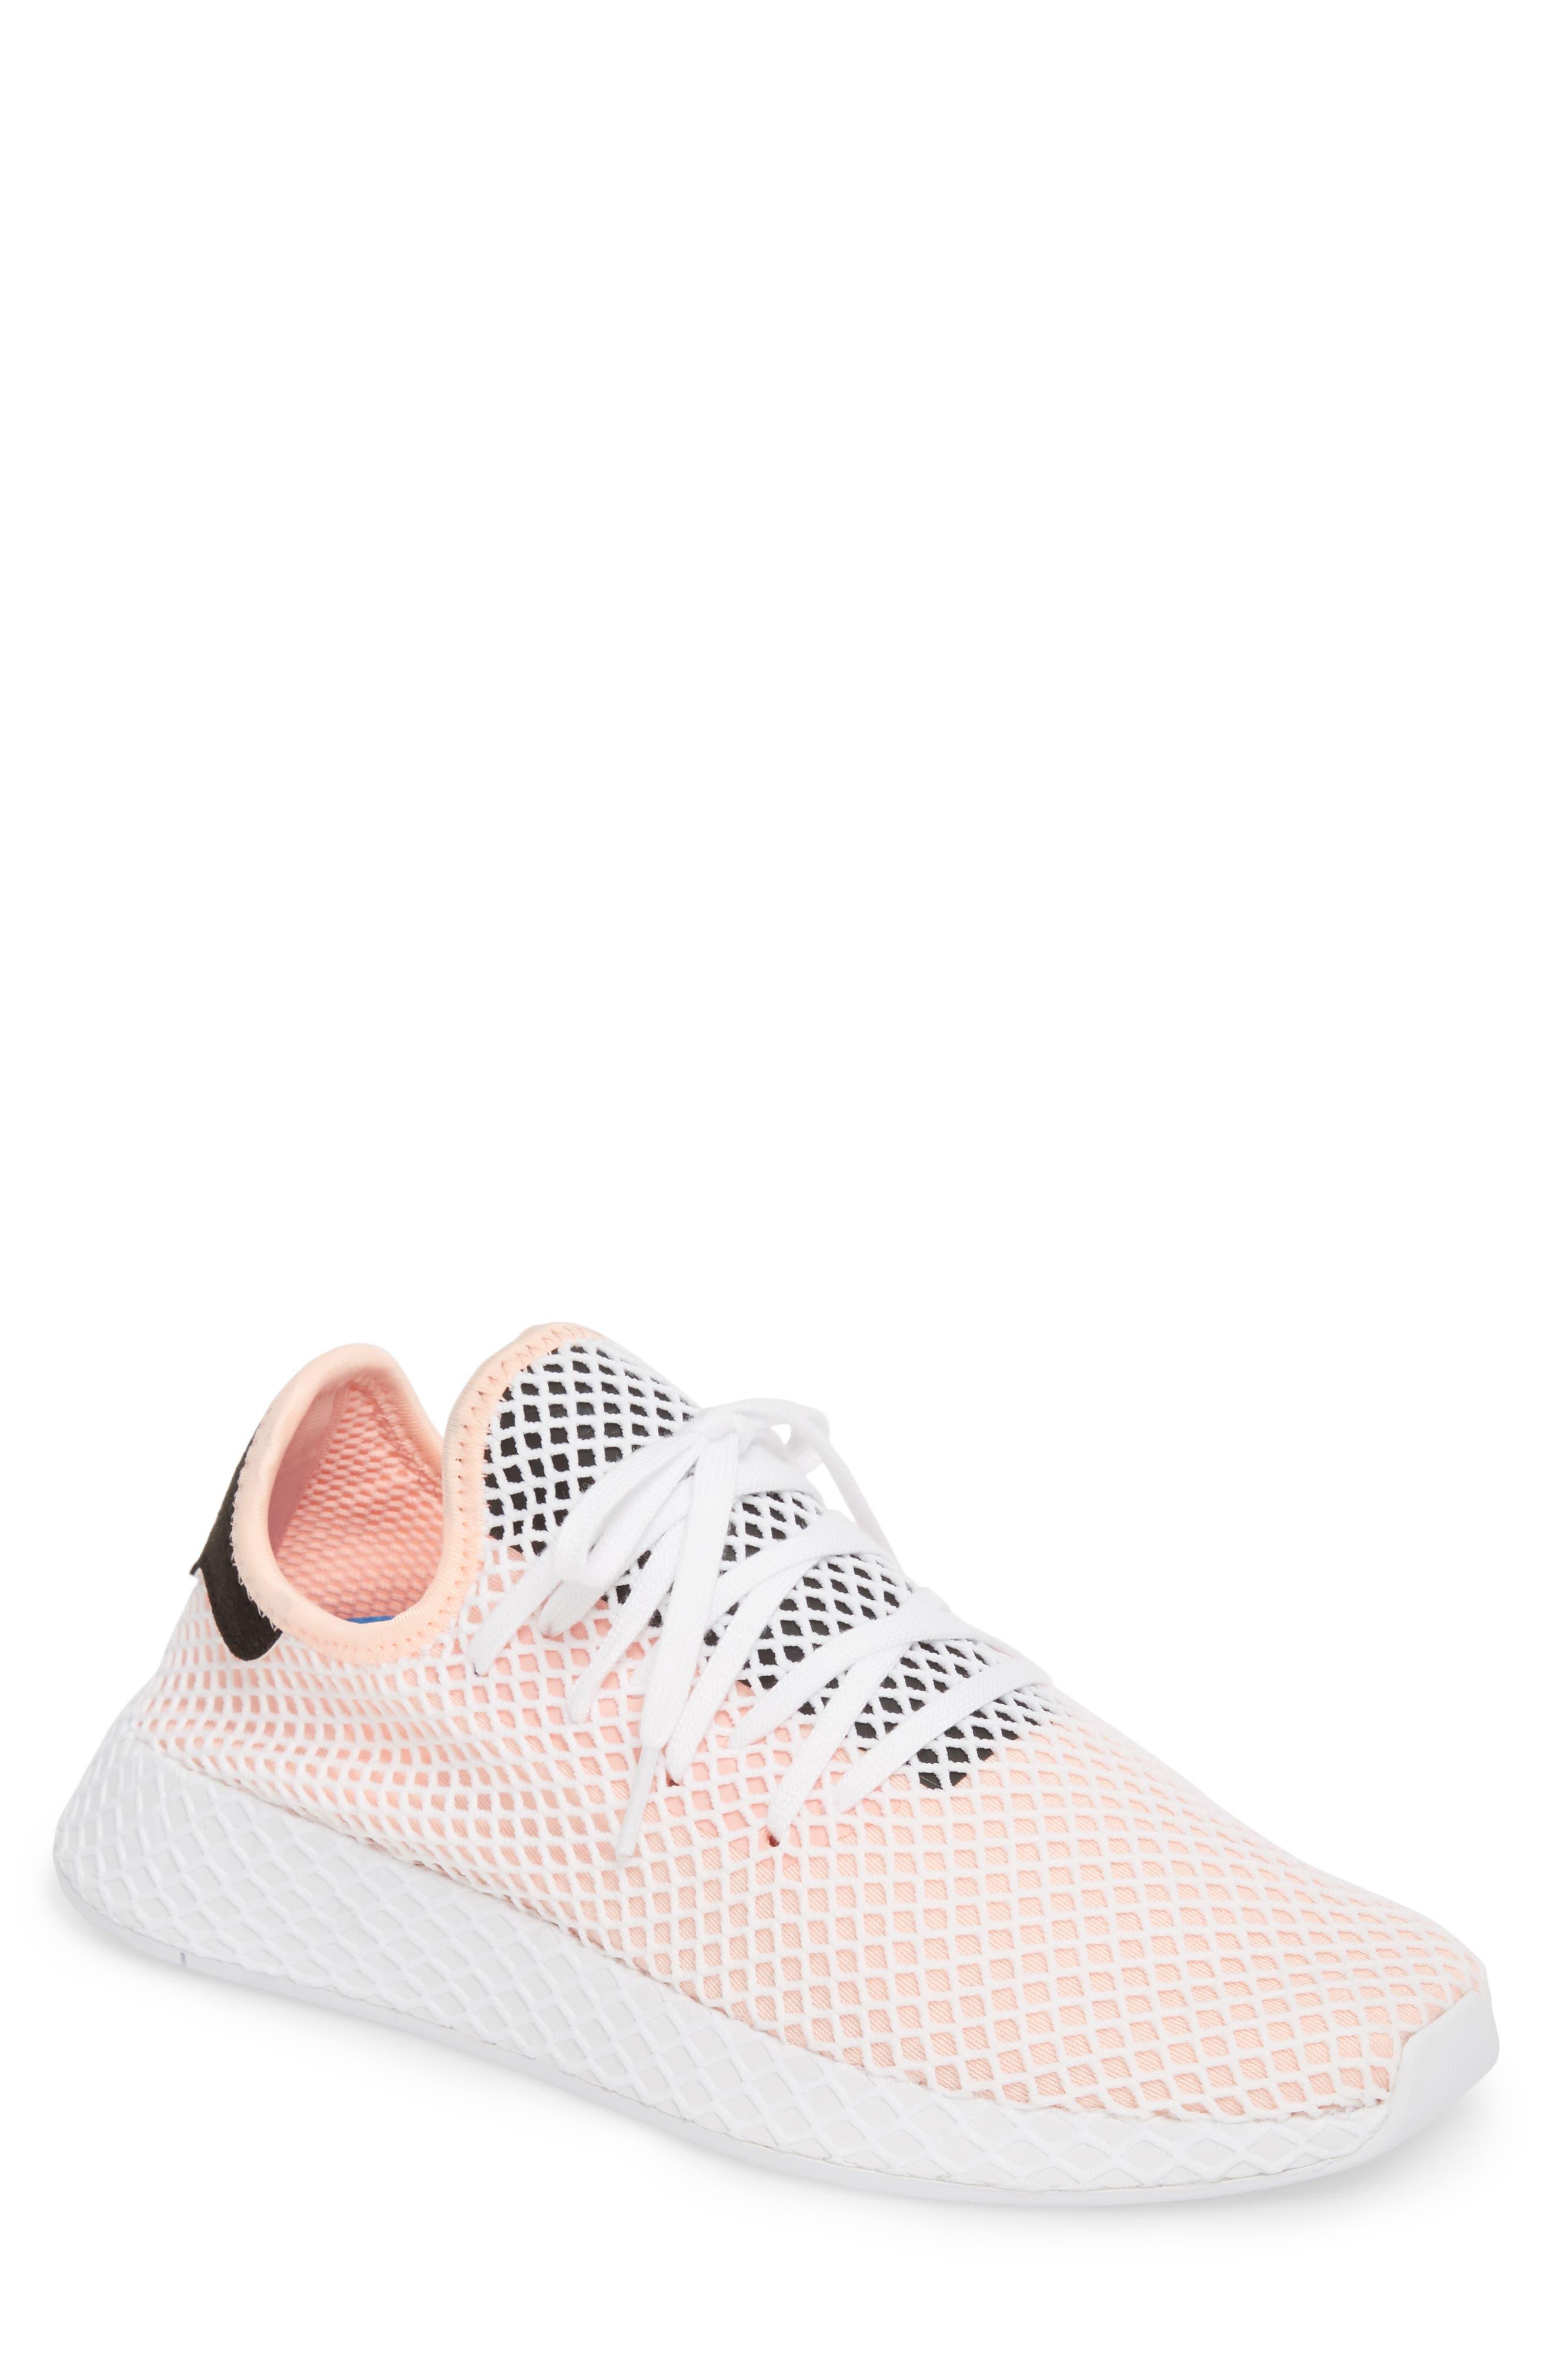 Deerupt Runner Sneaker,                         Main,                         color, BLACK/ BLACK/ WHITE